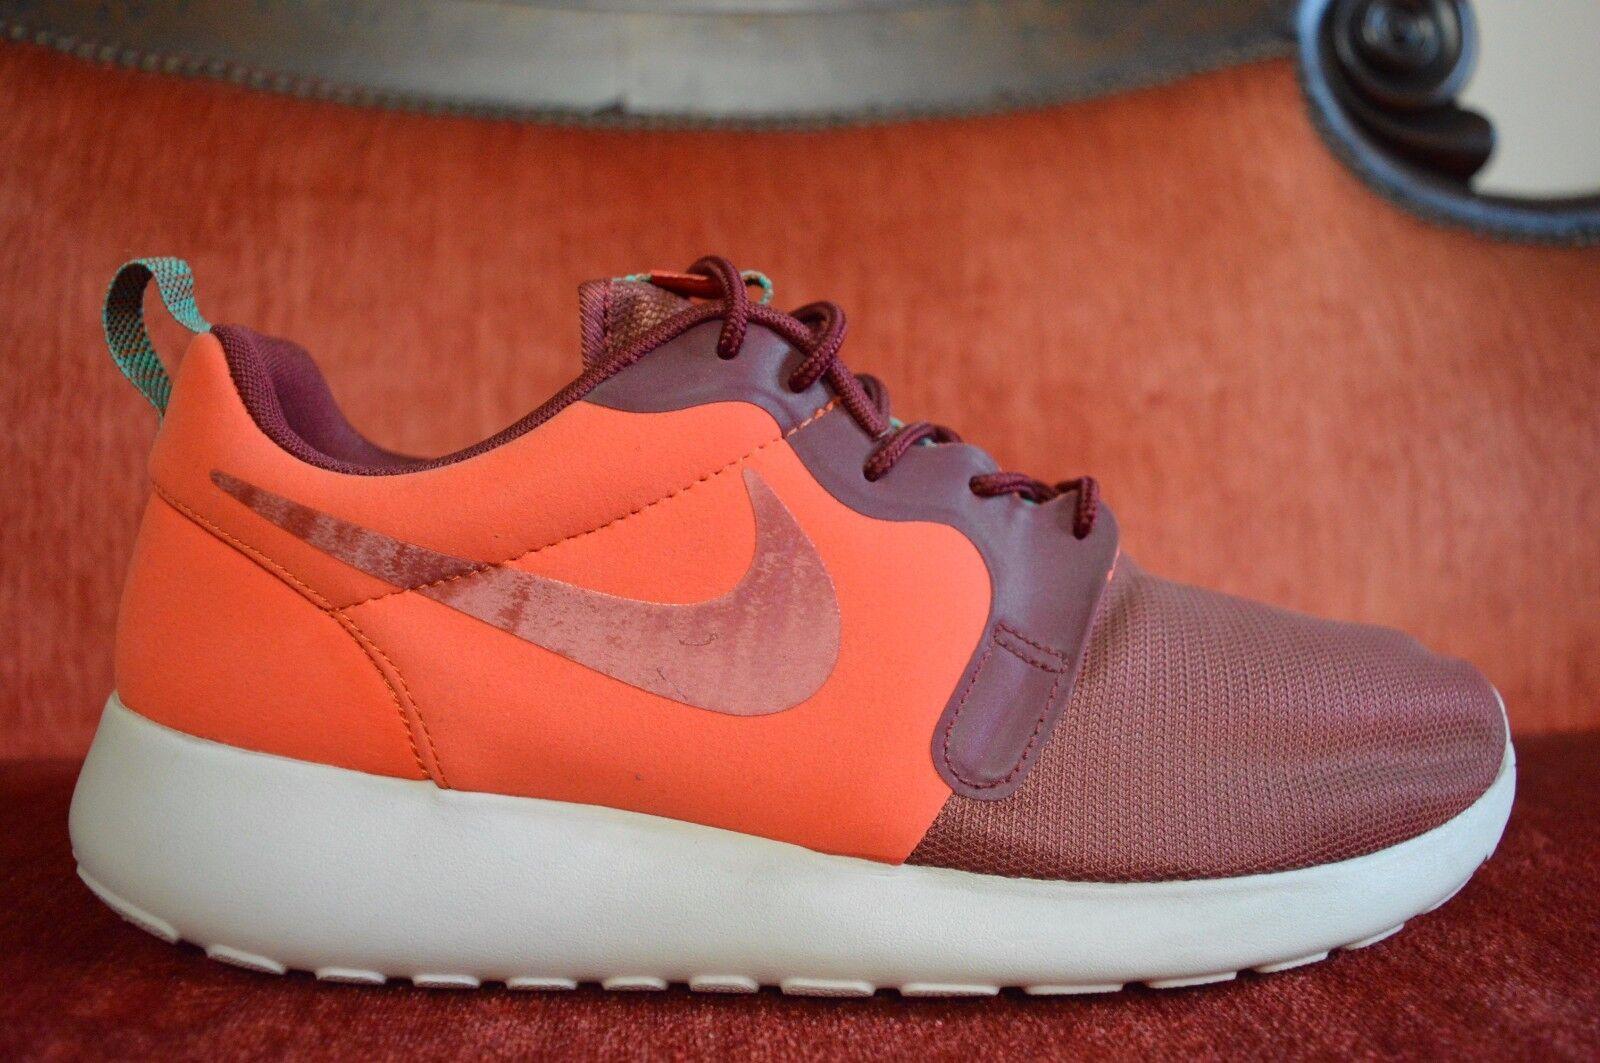 Nike roshe lauf hyp hyperfuse cedar 636220 801 team orange cedar hyperfuse rote hyper - jade - größe. d96184